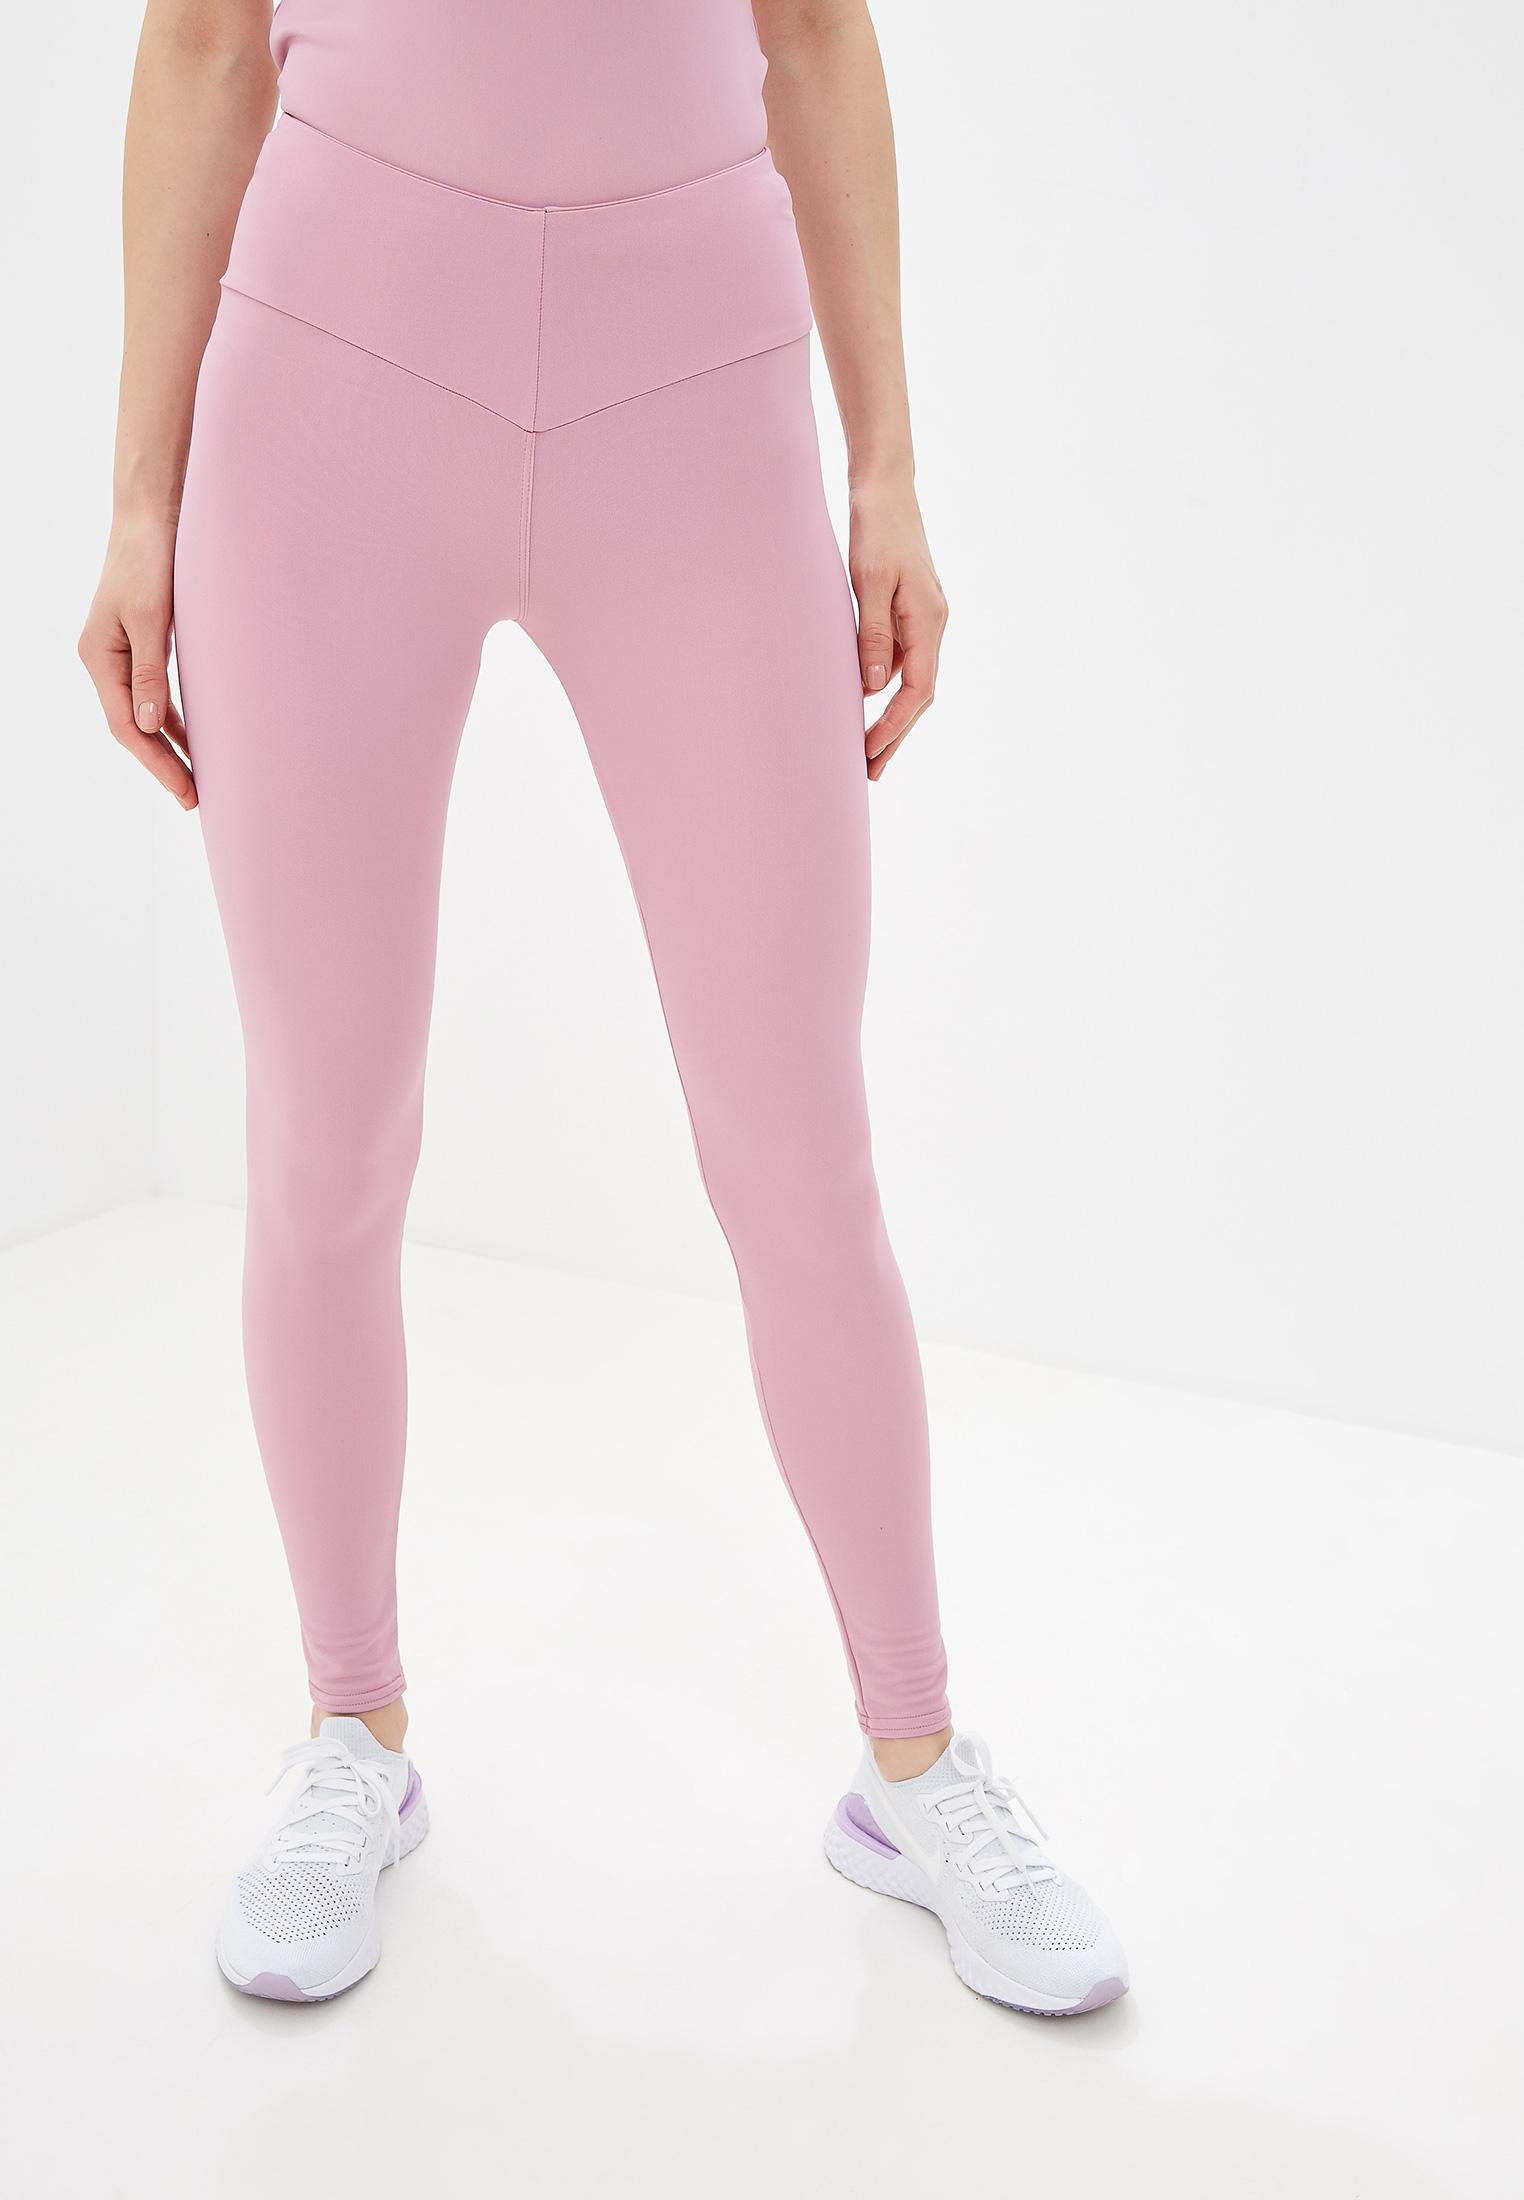 Женские брюки Sitlly 781